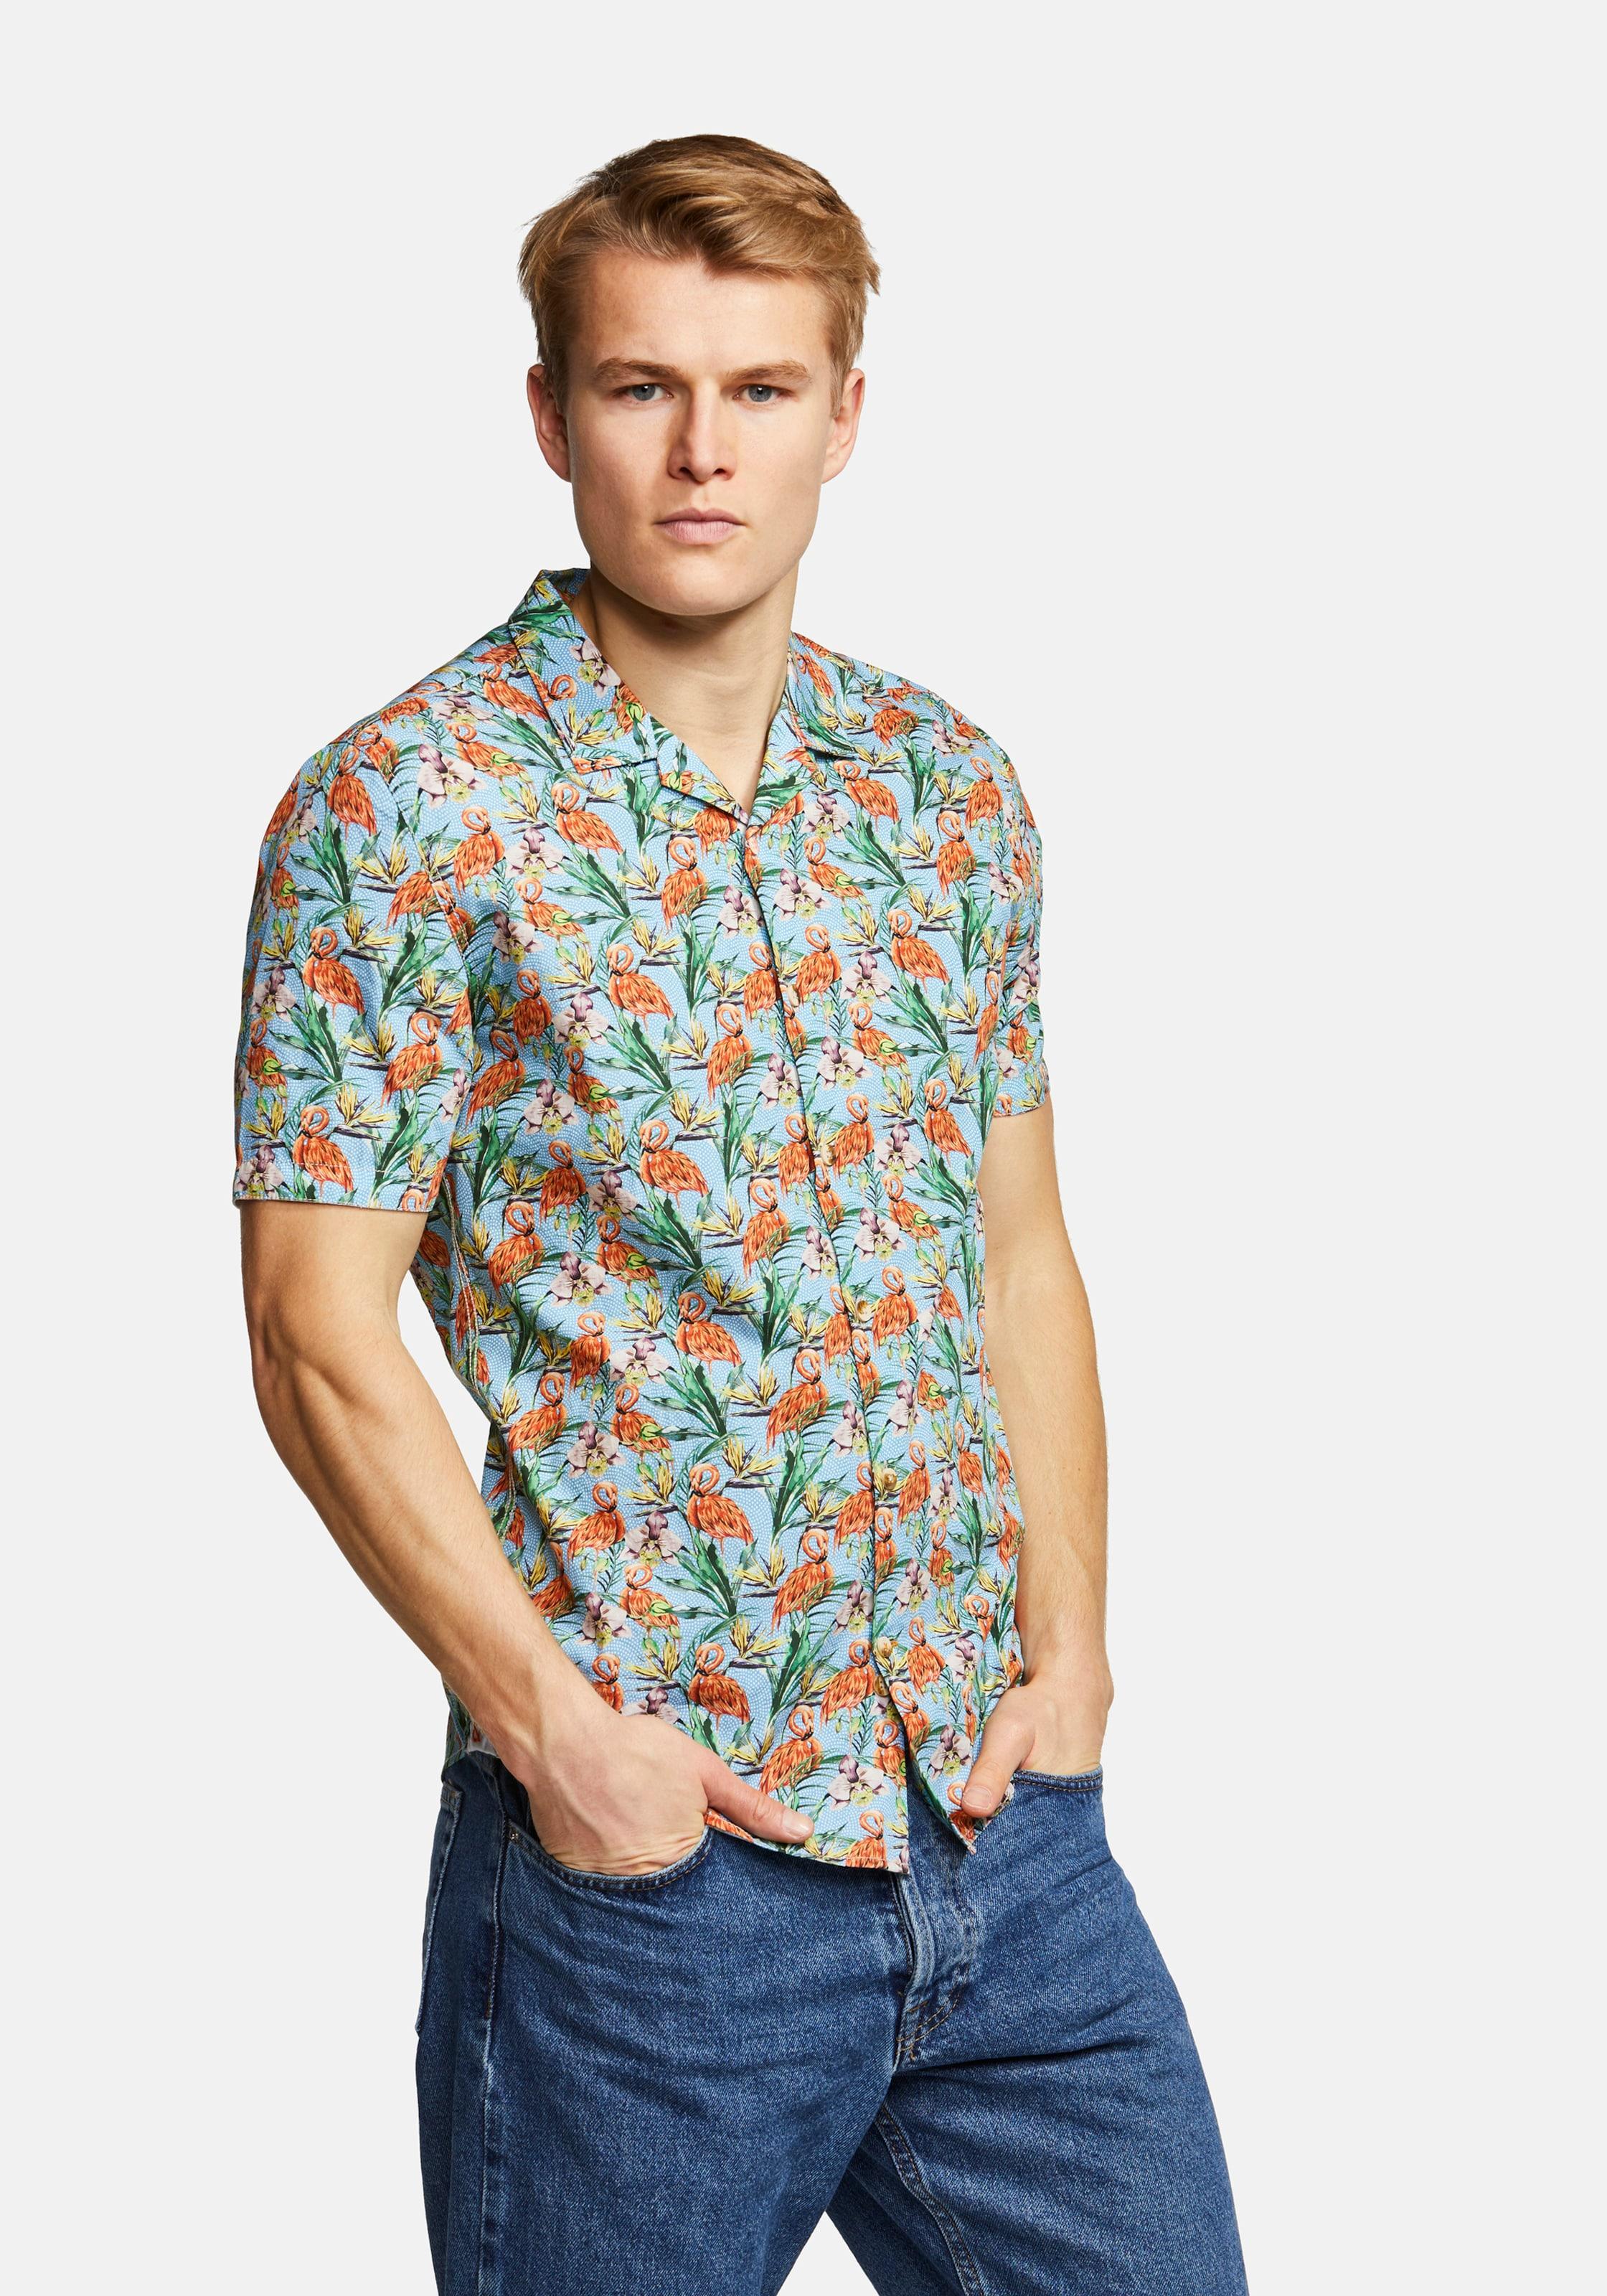 COLOURS & SONS Kurzarmhemd Flamingo-Print COLIN in grün / mint Sweatstoff ART125411-002